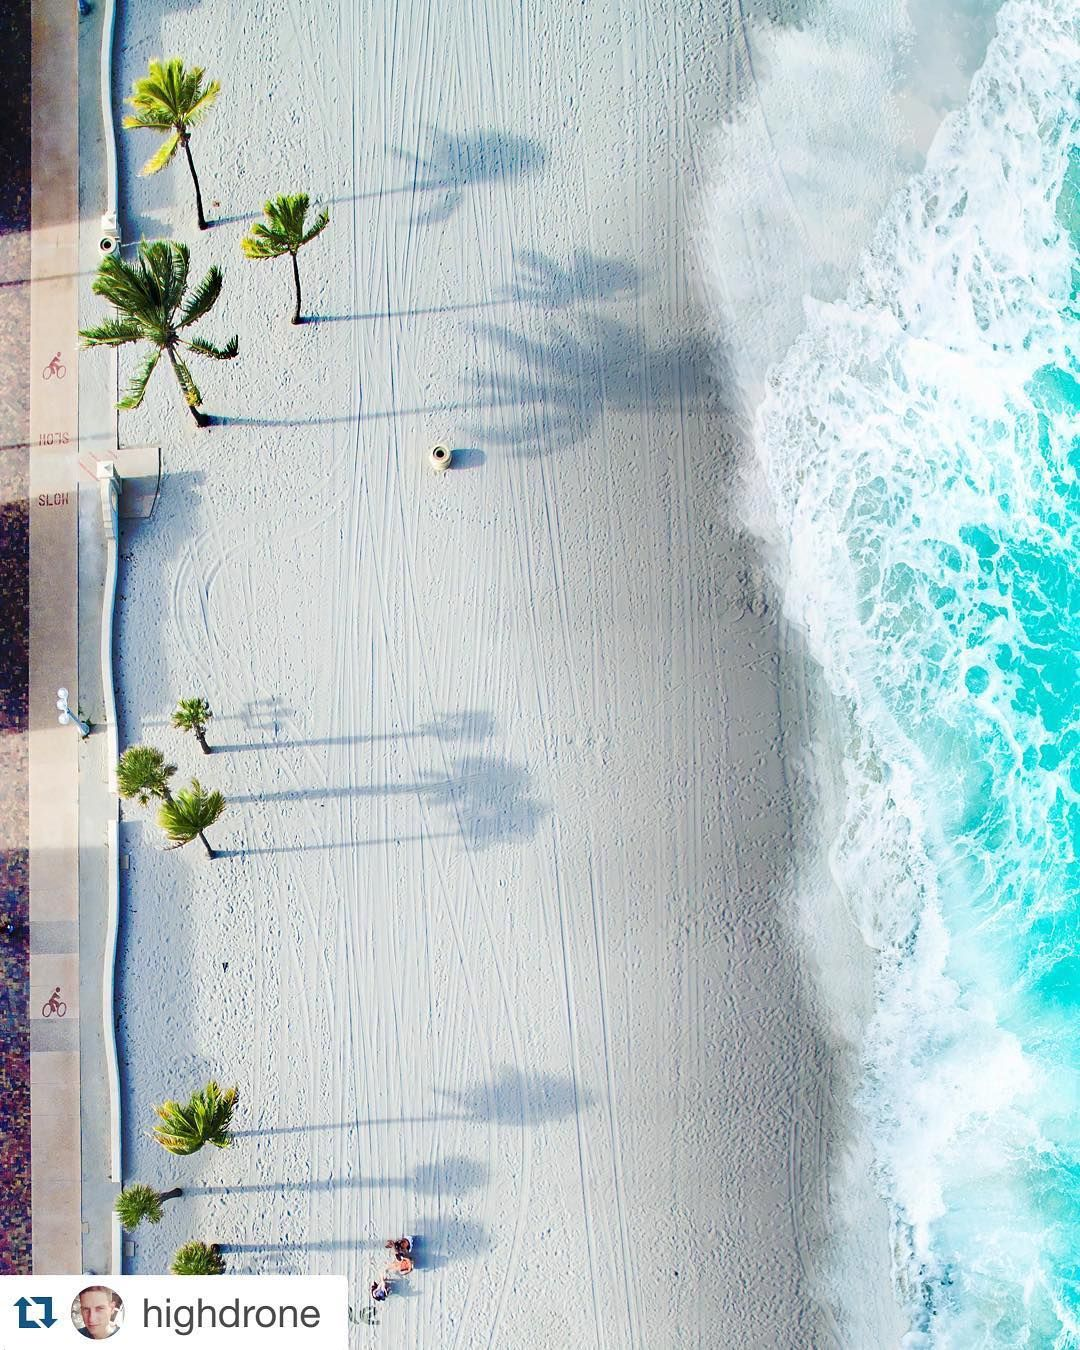 Fort lauderdale beach florida highdrone